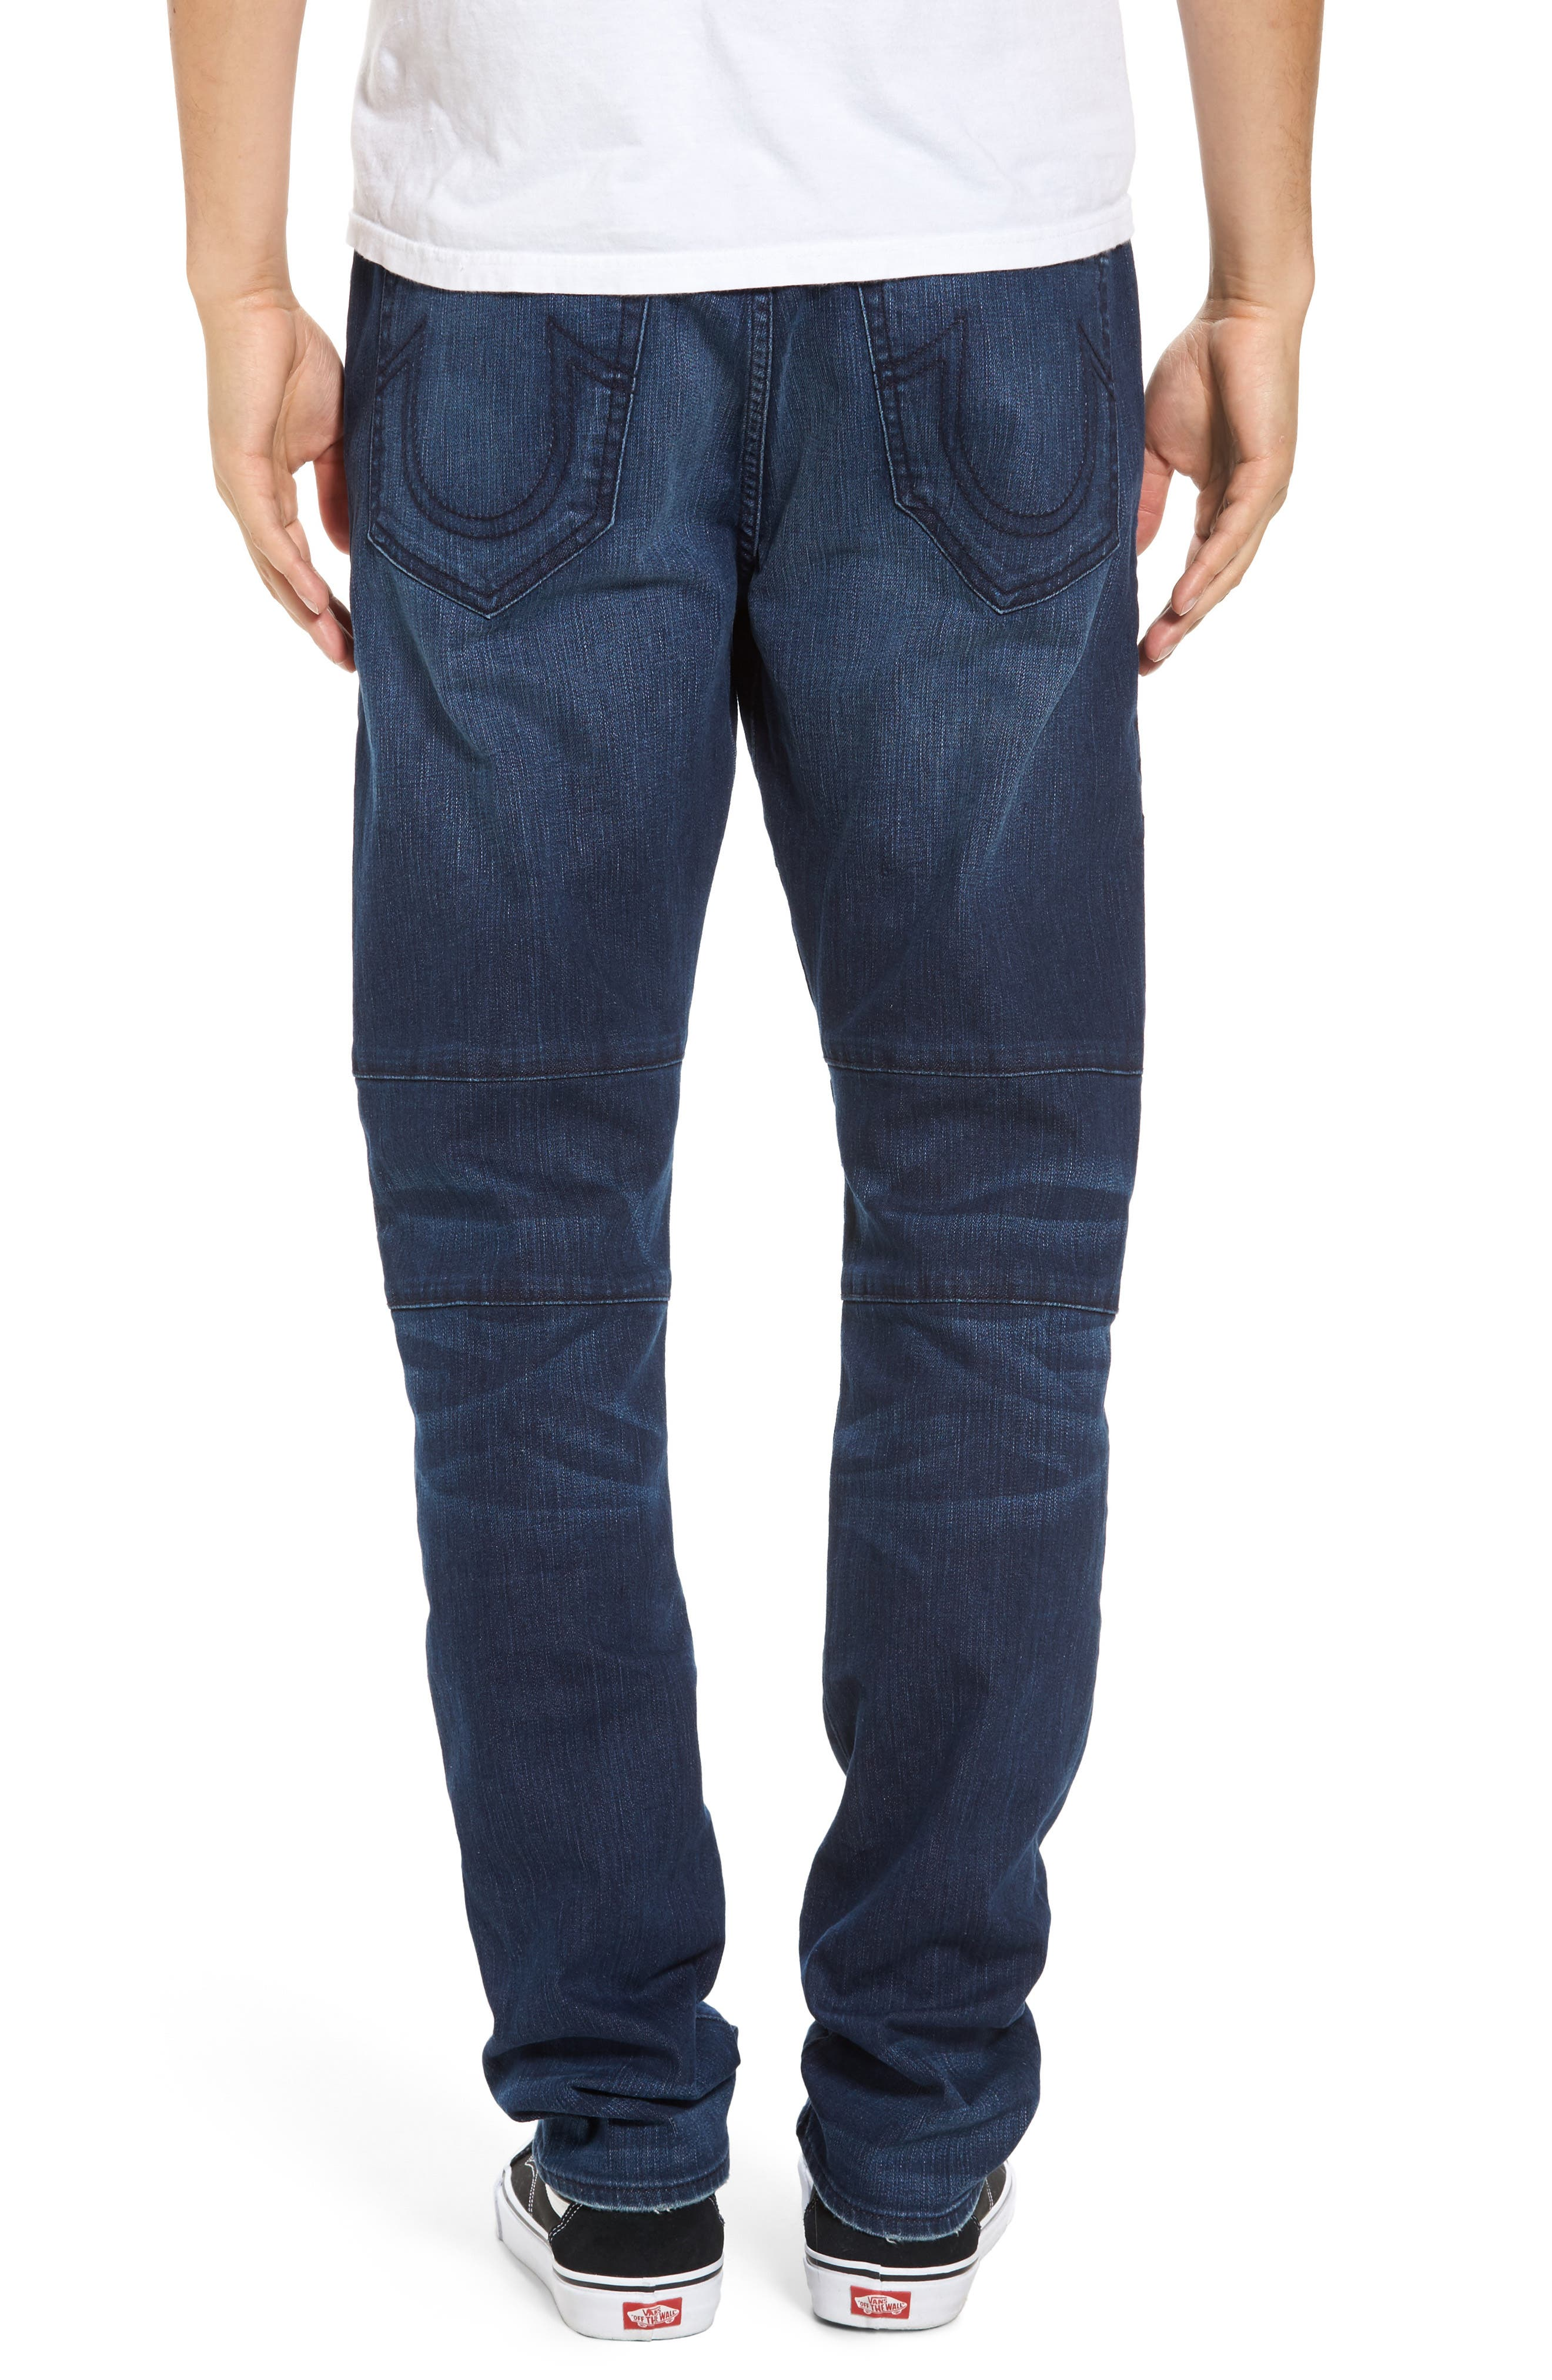 Alternate Image 2  - True Religion Brand Jeans Rocco Biker Skinny Fit Jeans (Rebel Race)